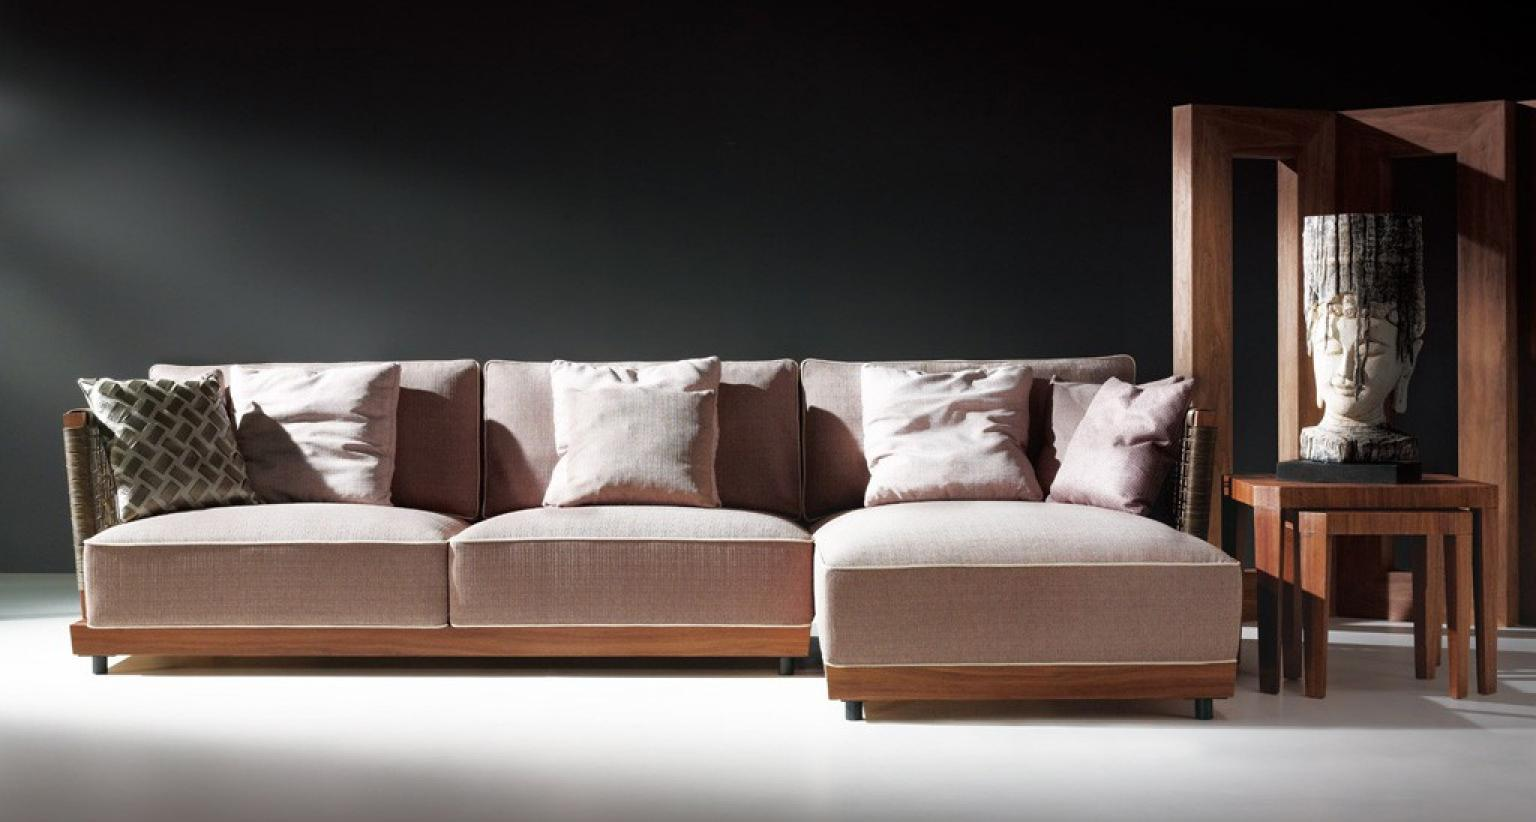 photos canap bois tissu. Black Bedroom Furniture Sets. Home Design Ideas